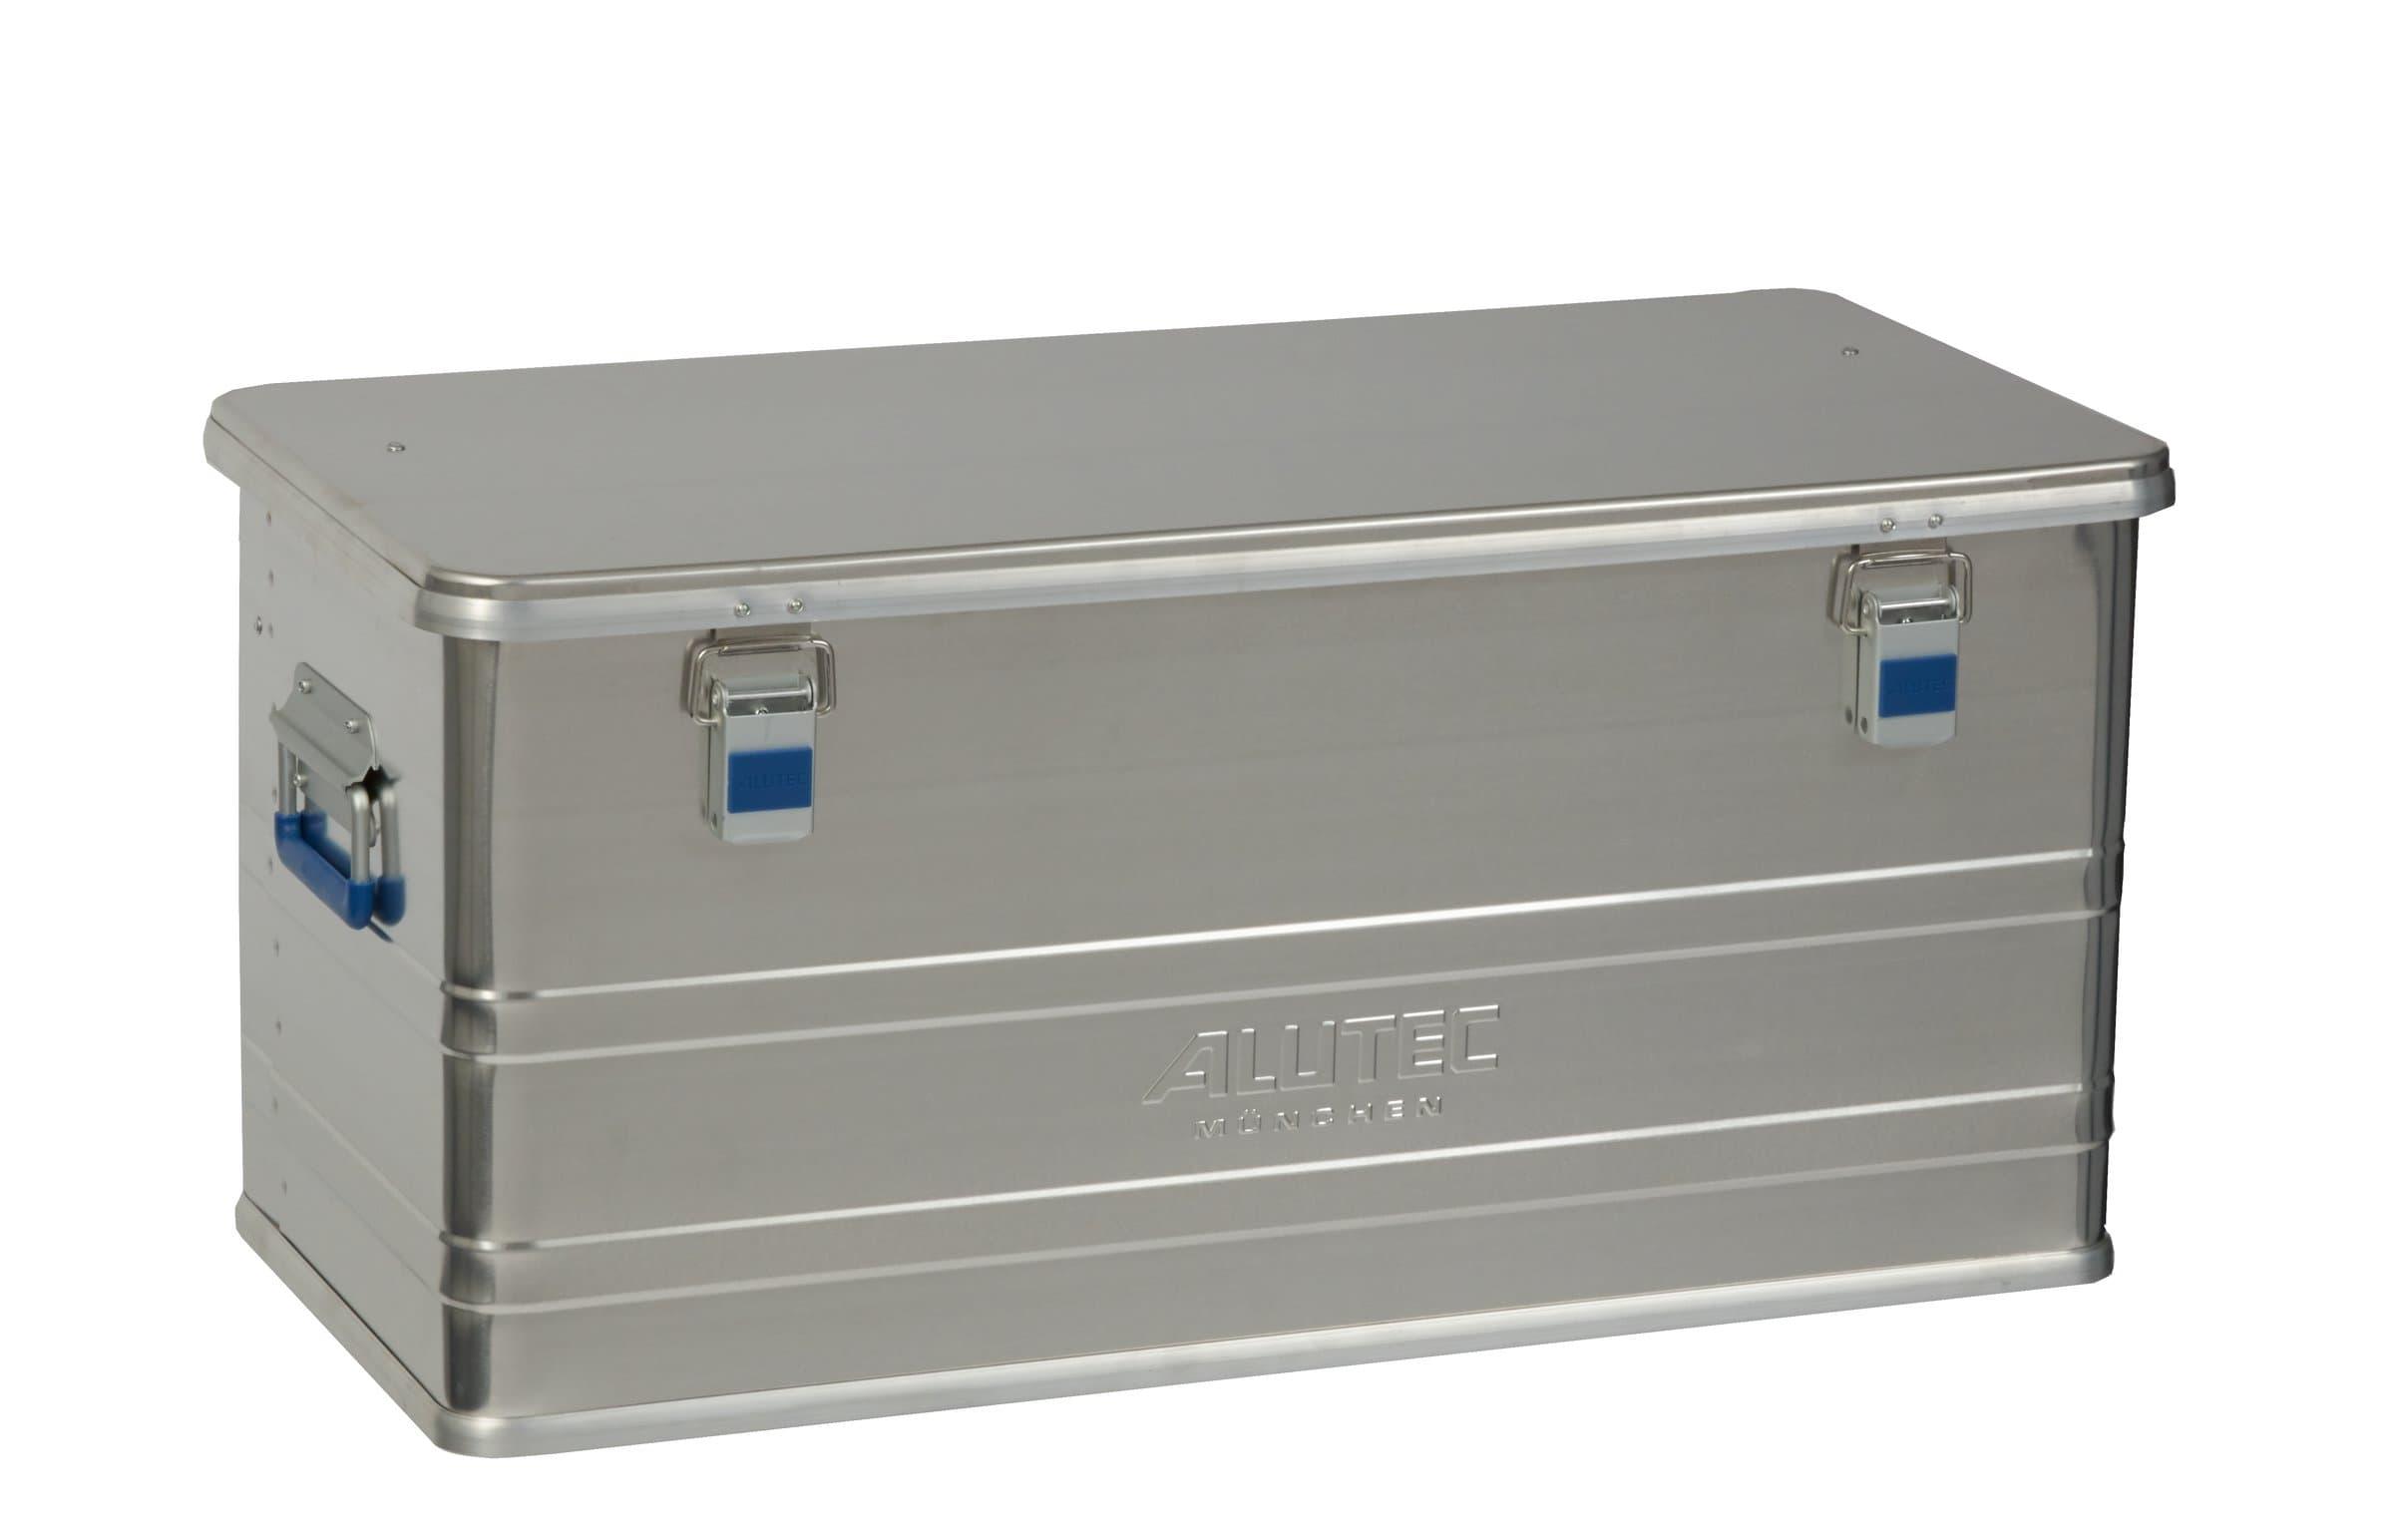 Alutec Aluminiumbox COMFORT 92 1 mm